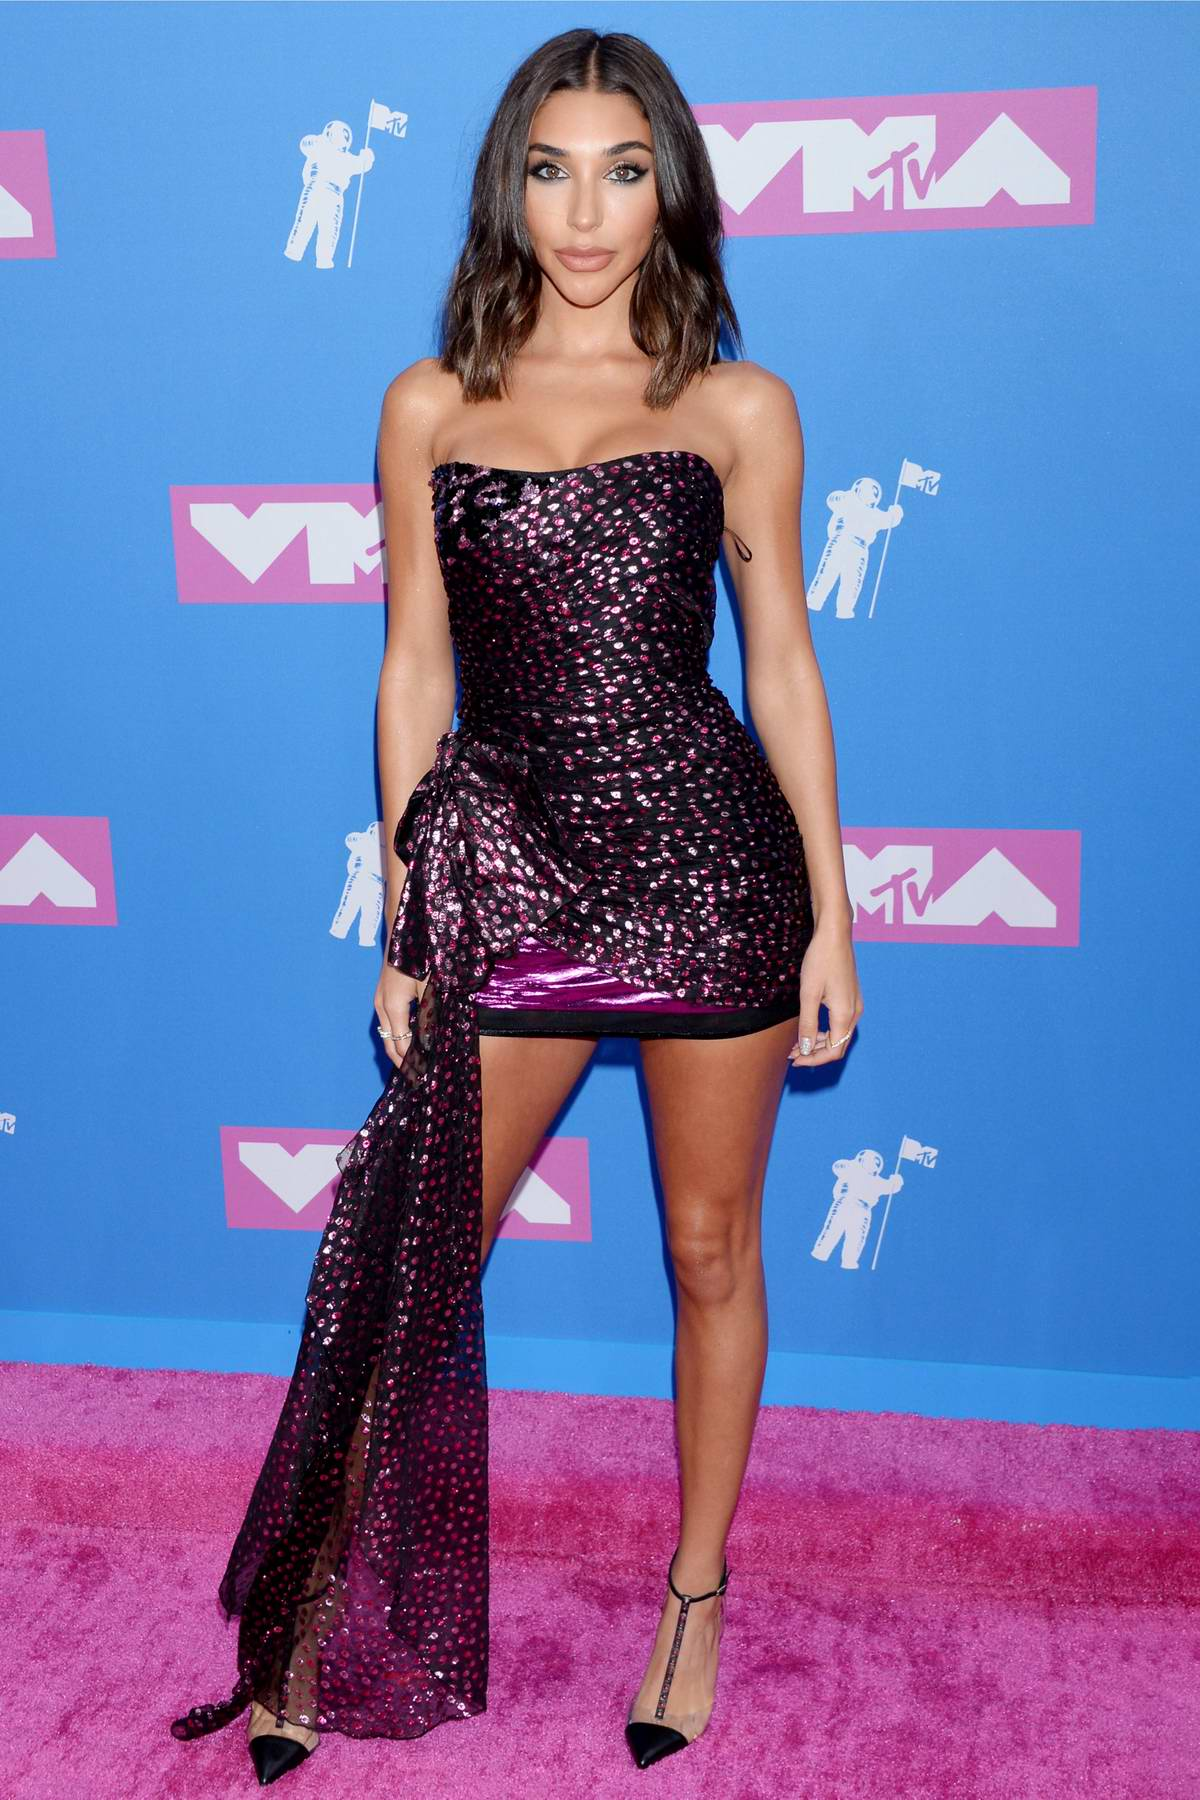 Chantel Jeffries attends 2018 MTV Video Music Awards (MTV VMA 2018) at Radio City Music Hall in New York City